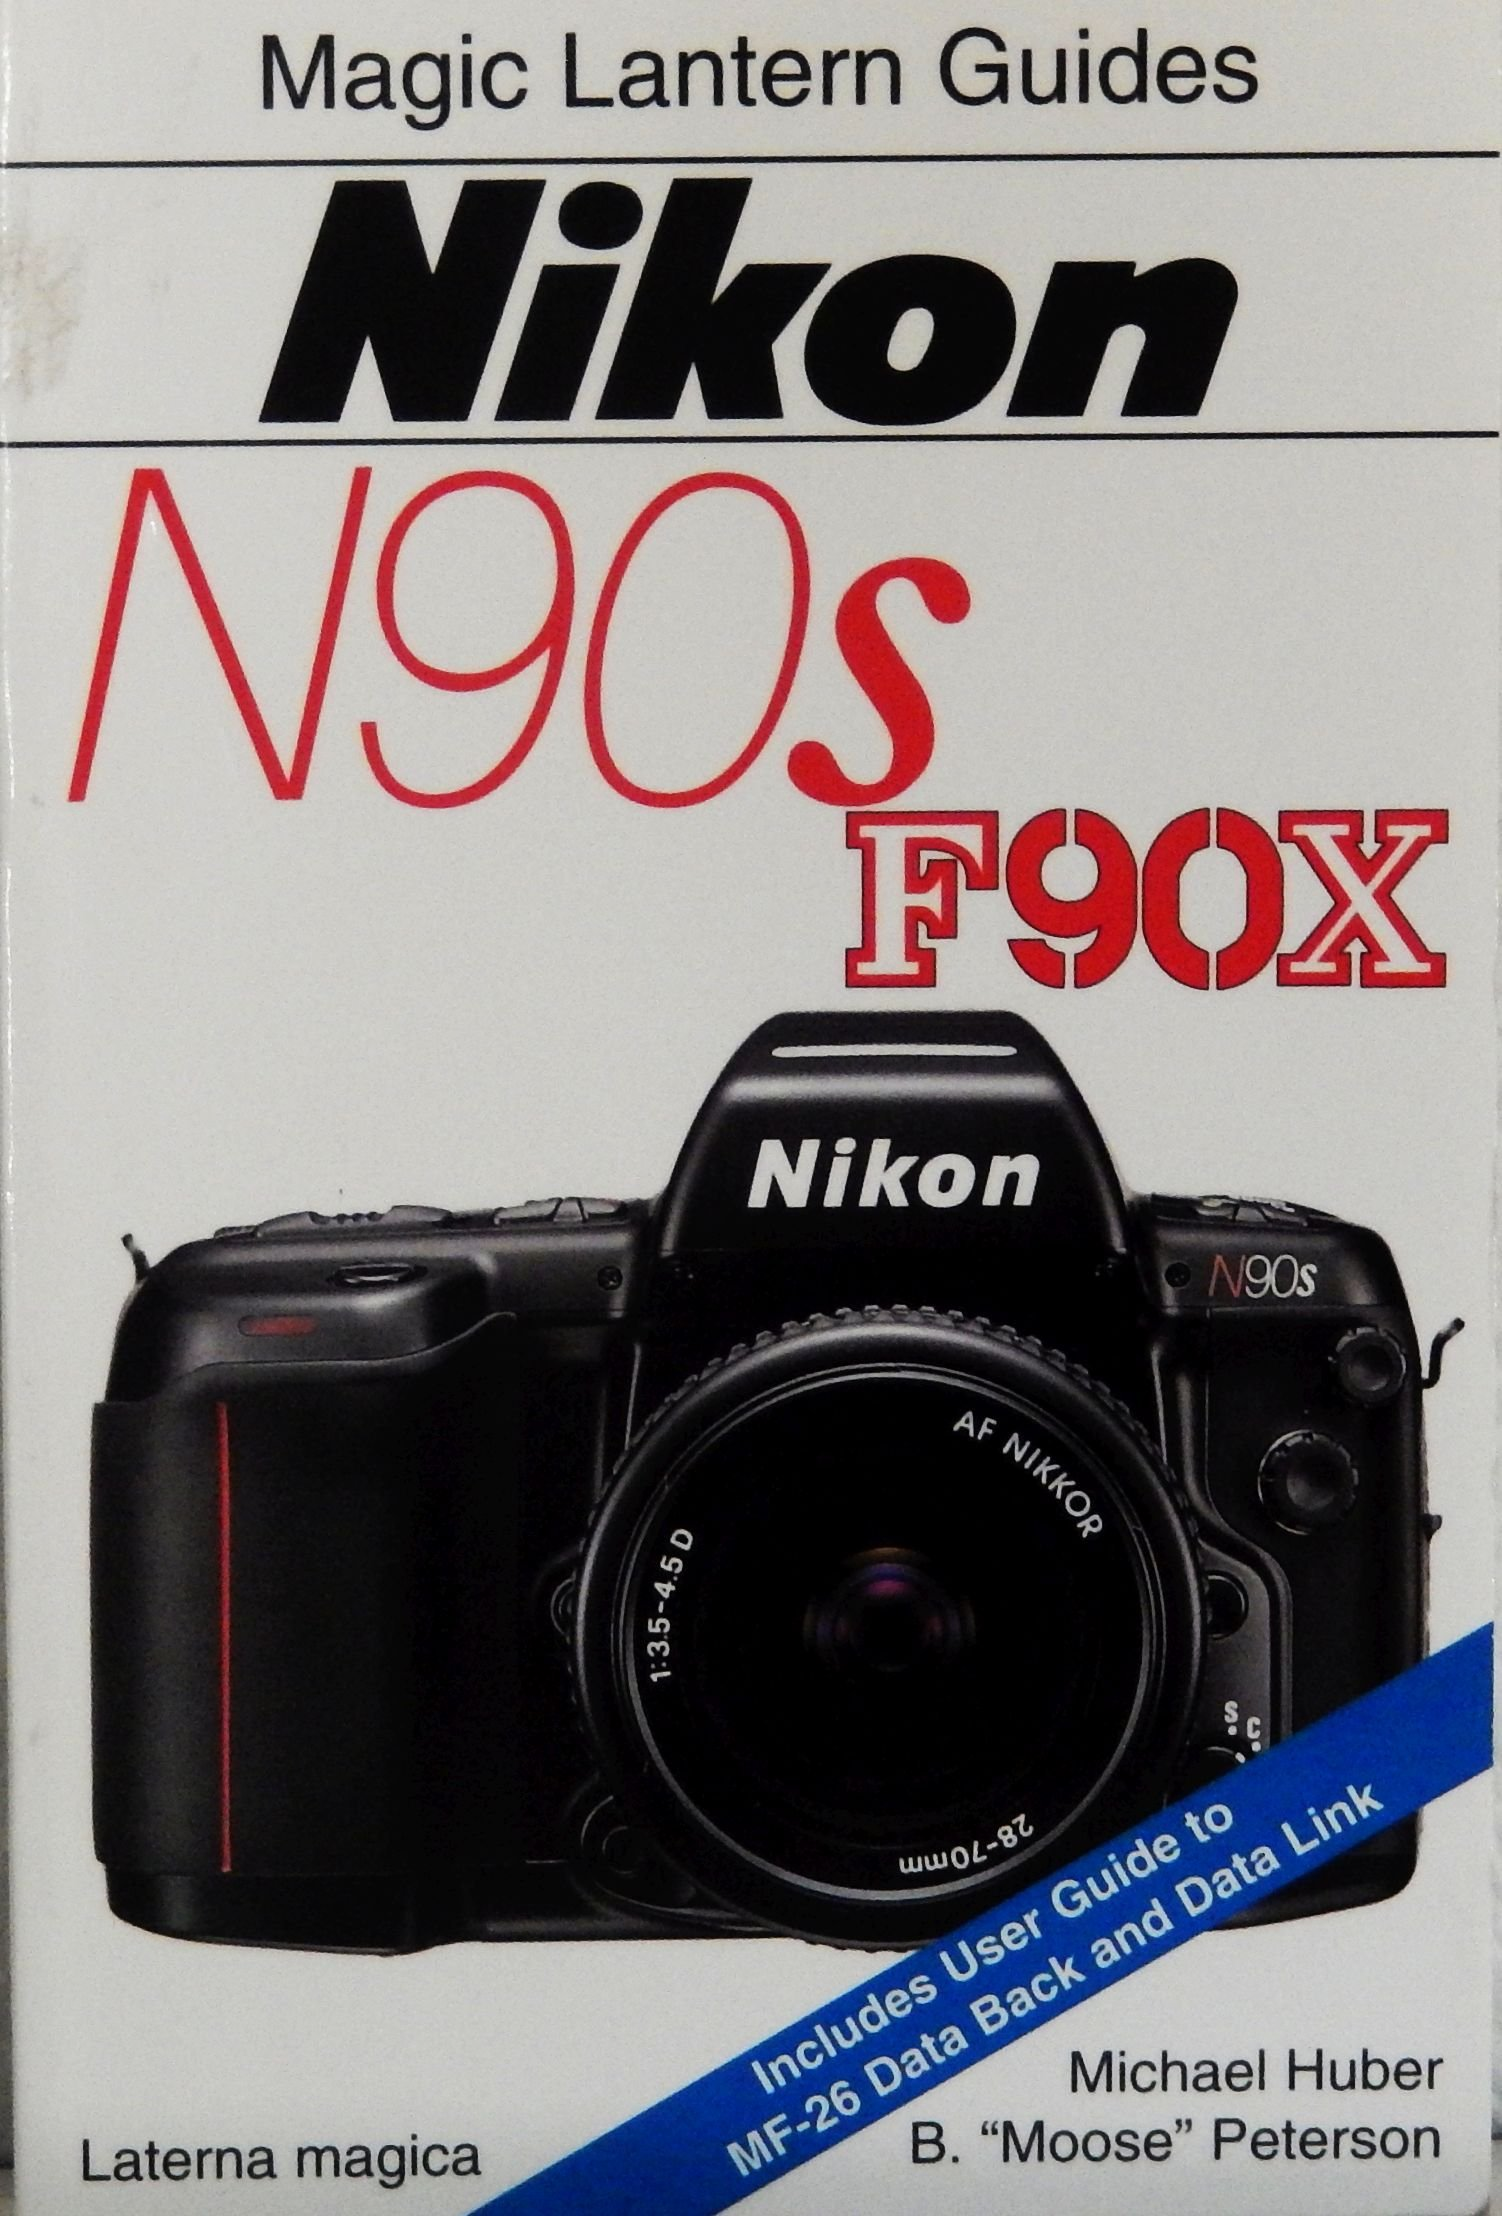 Nikon N90S-F90X (Magic Lantern Guides): Michael Huber, B. Peterson:  9781883403201: Amazon.com: Books